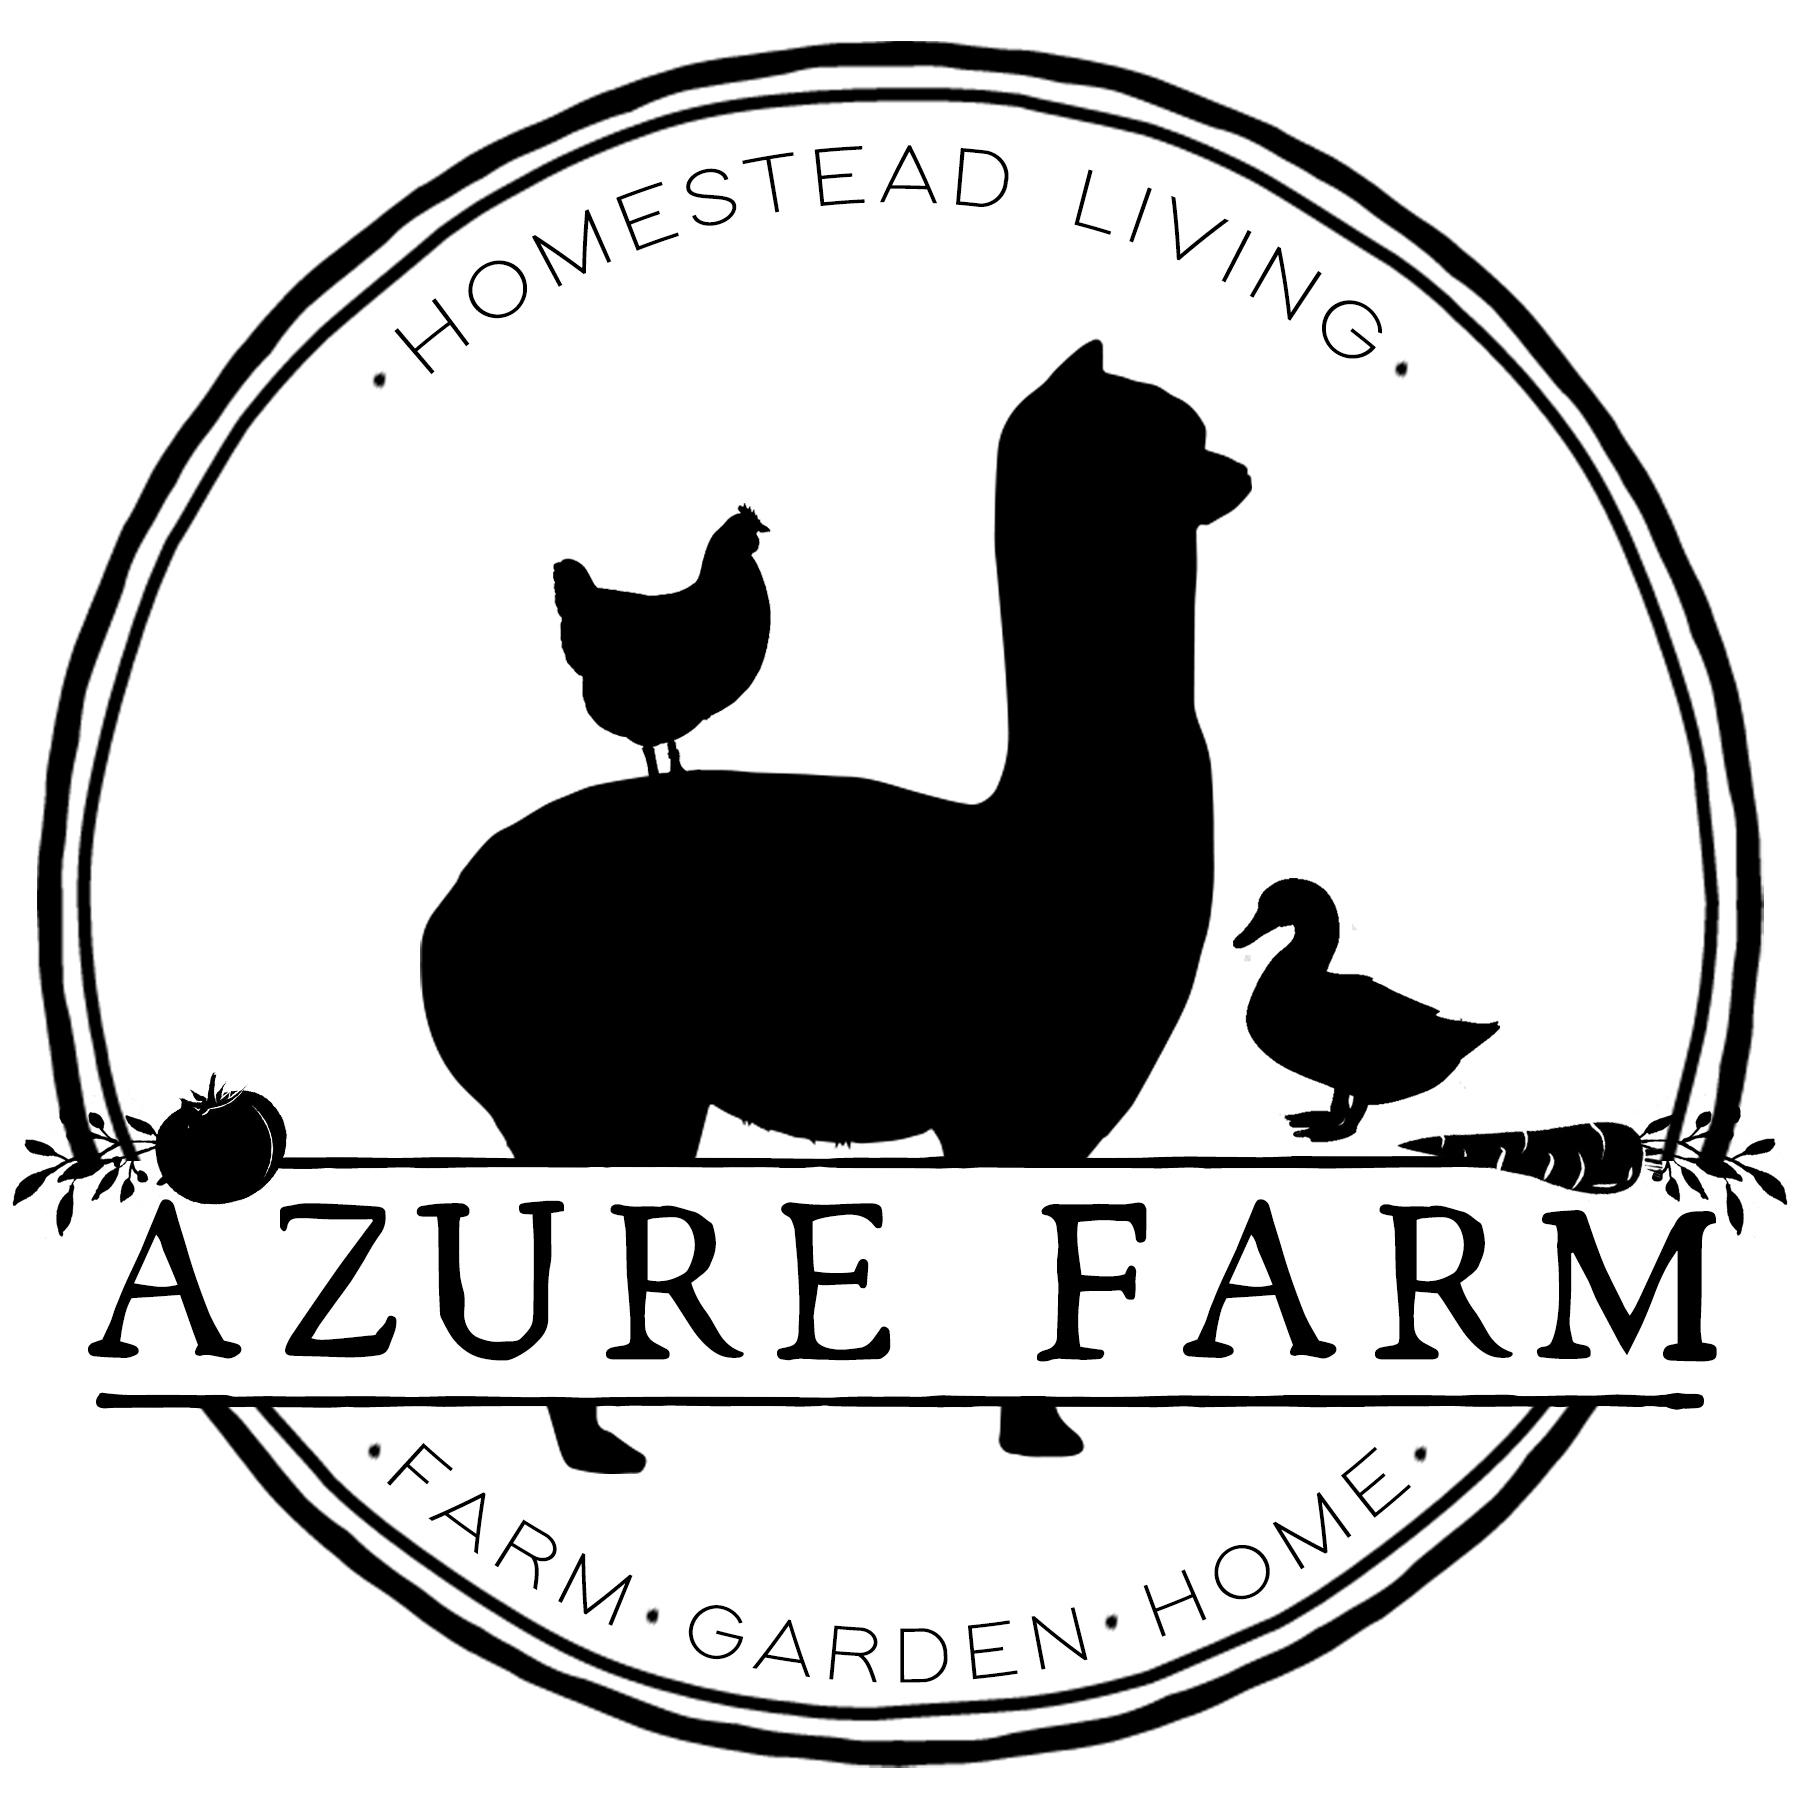 Azure Farm